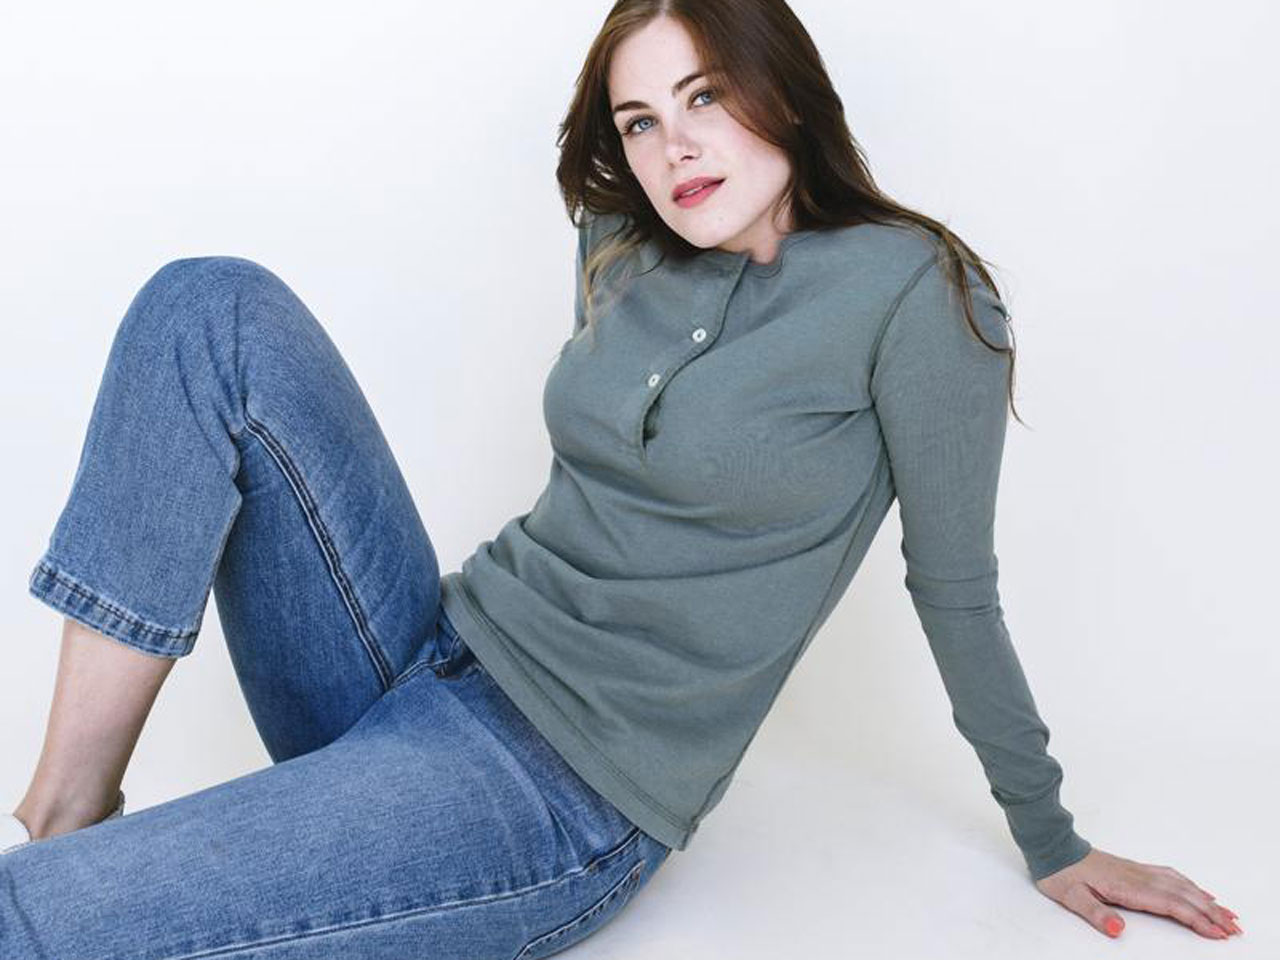 Tradlands   Essentials for Women   Shop Henley Deal